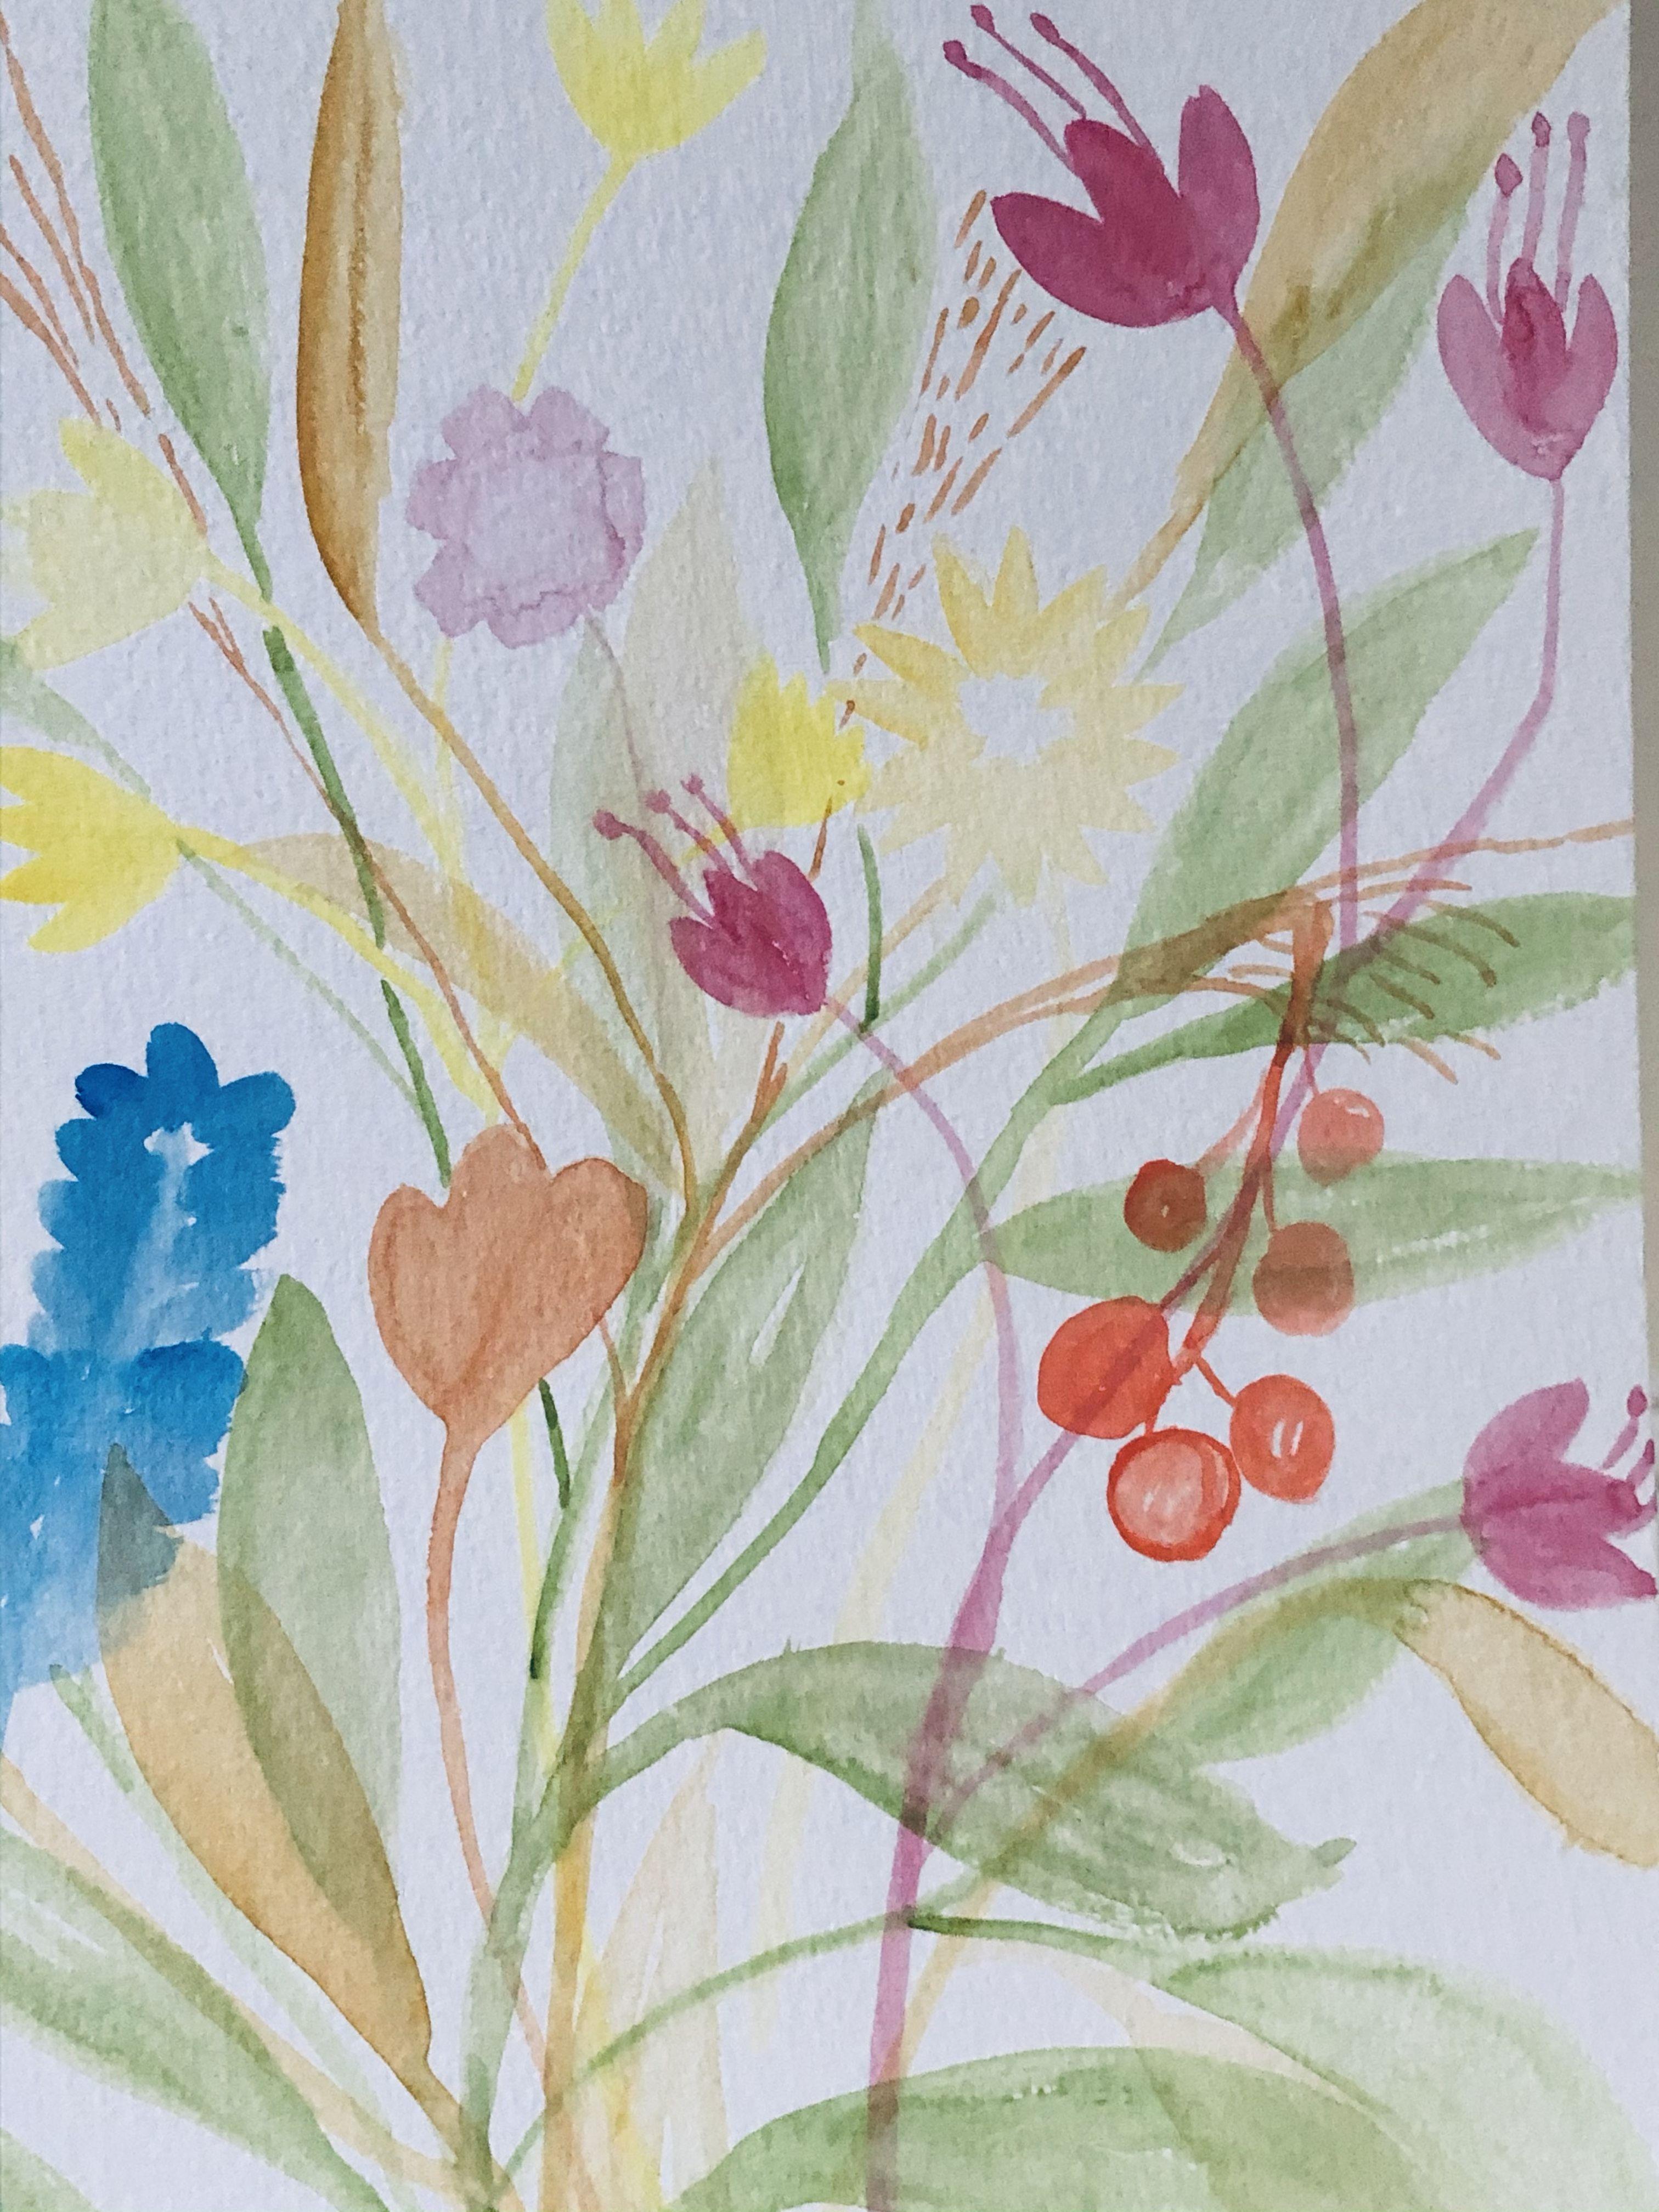 Imagination #ArtTherapy #Lovetopaint #Design #Watercolor – World Through Lenses